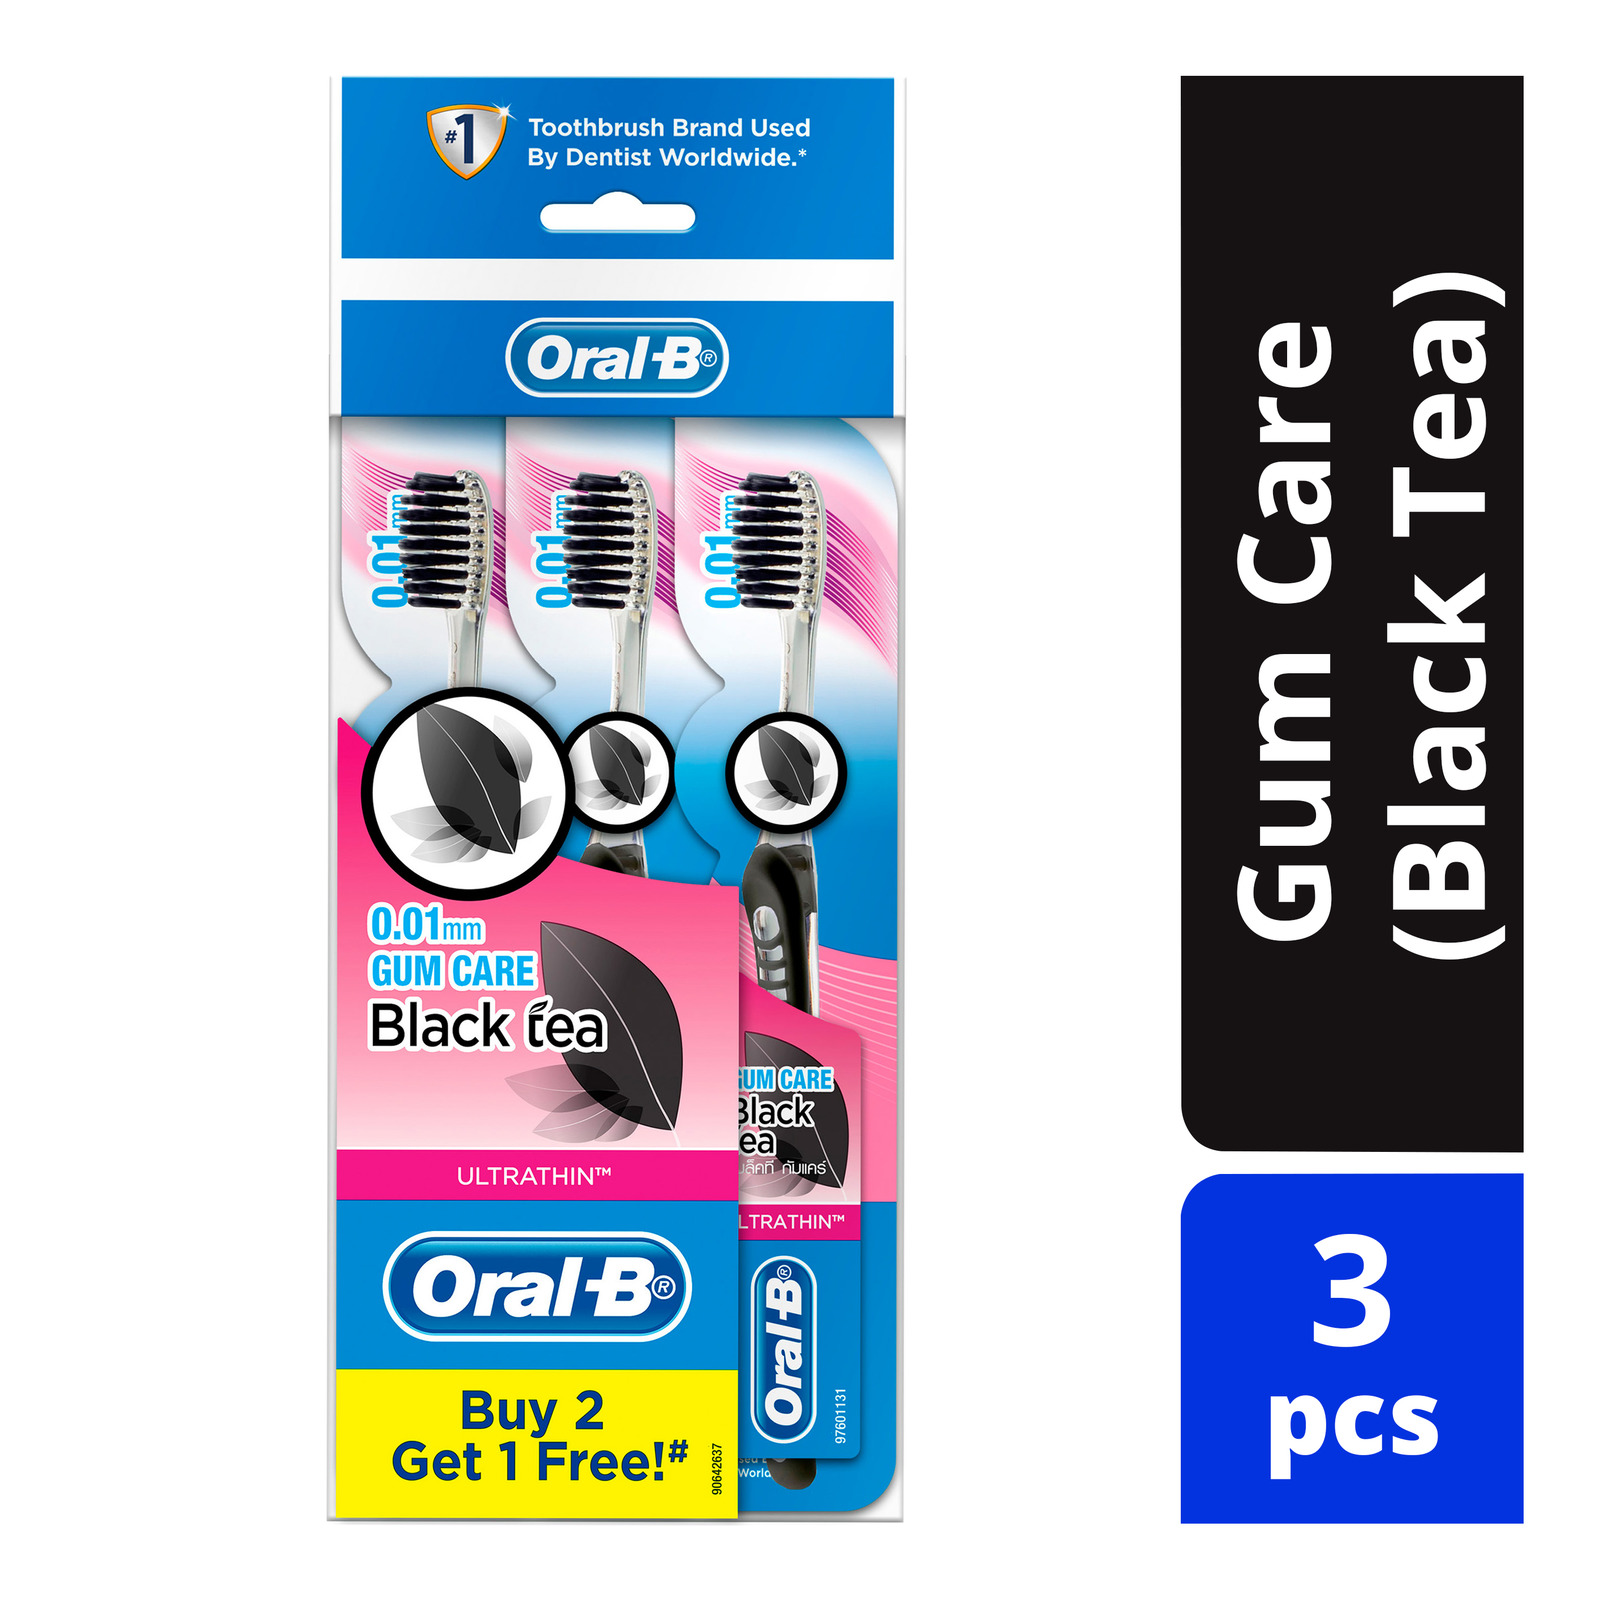 Oral-B Ultra Thin Toothbrush - Gum Care (Black Tea)